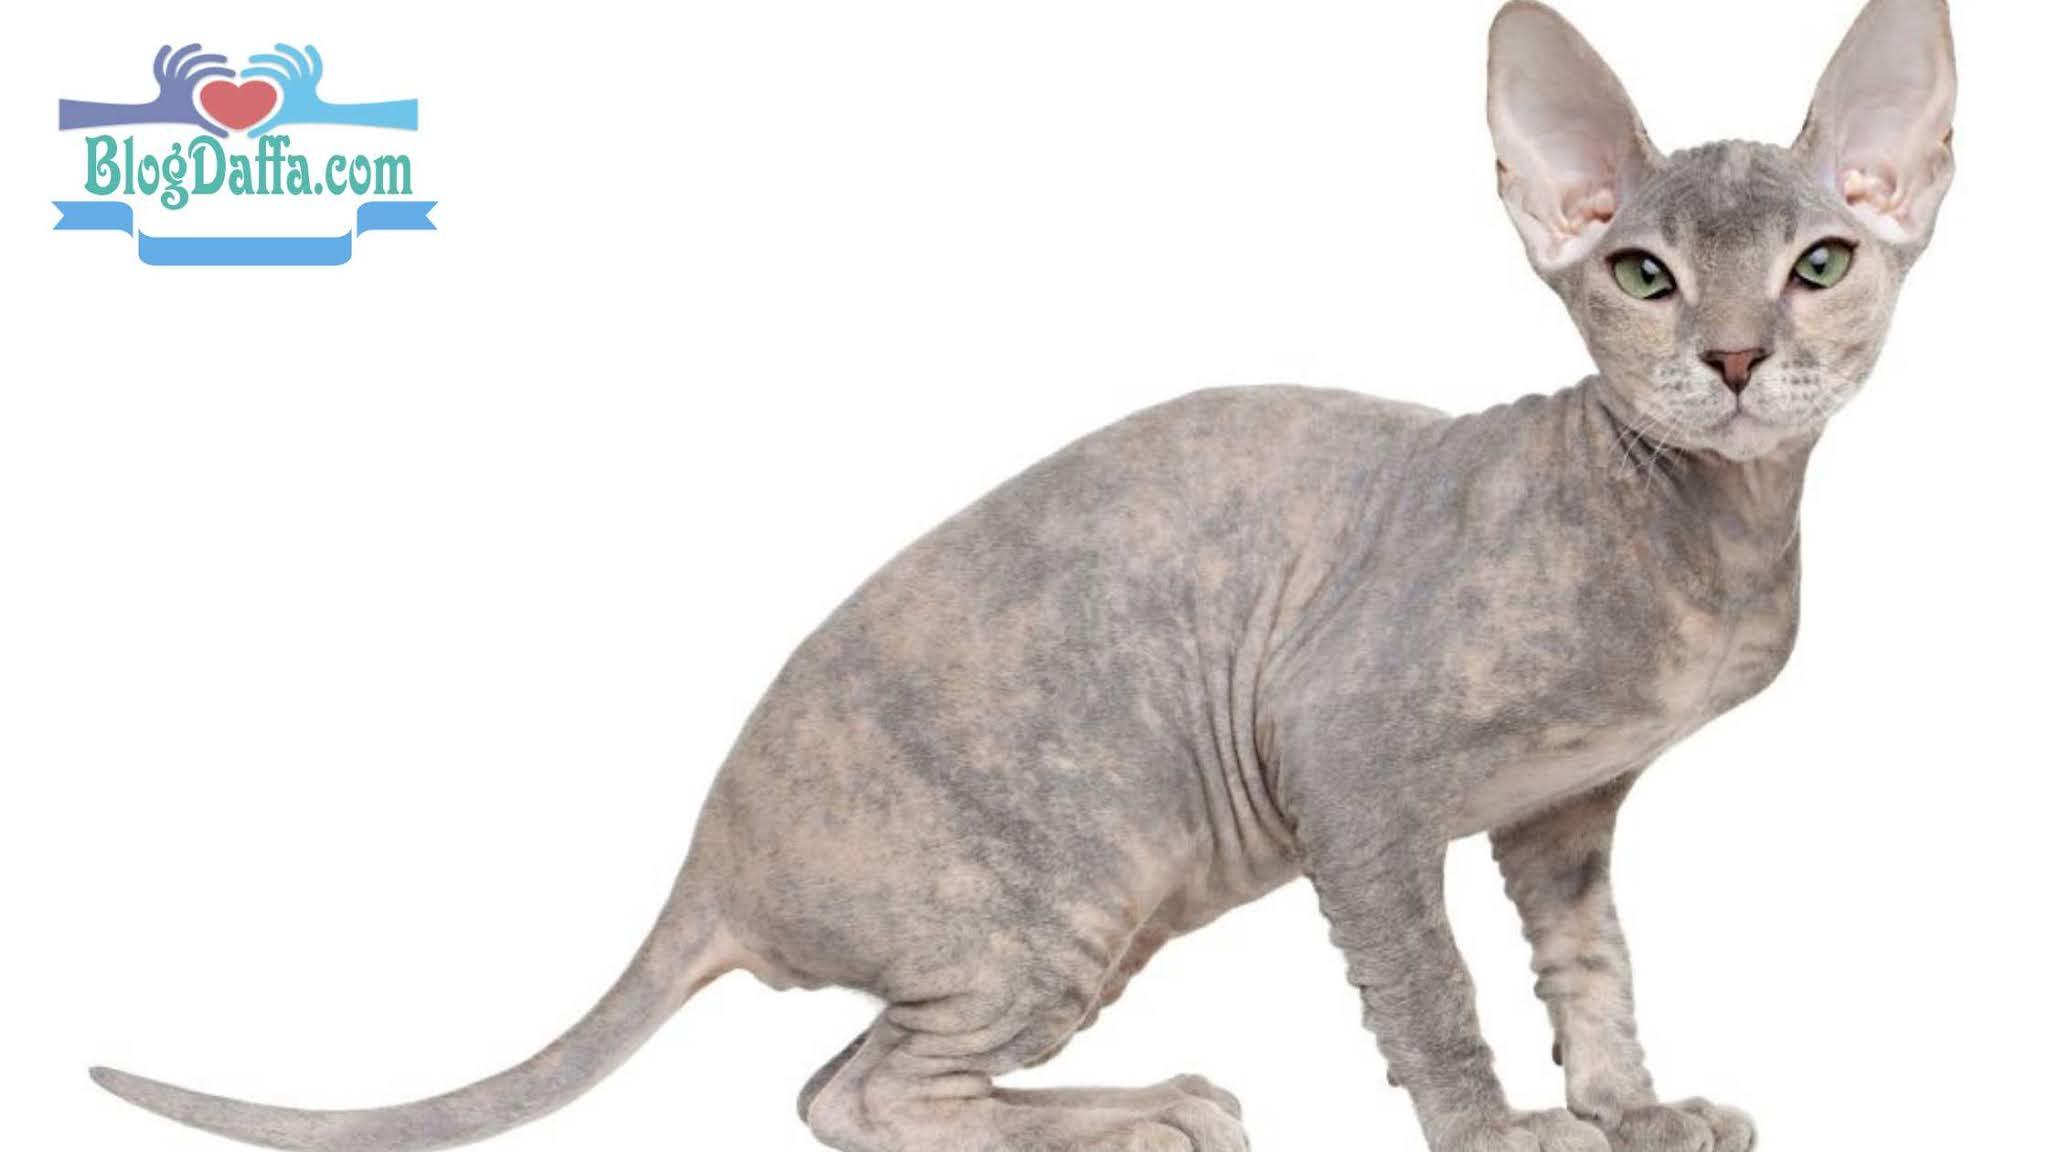 Jenis kucing peterbald